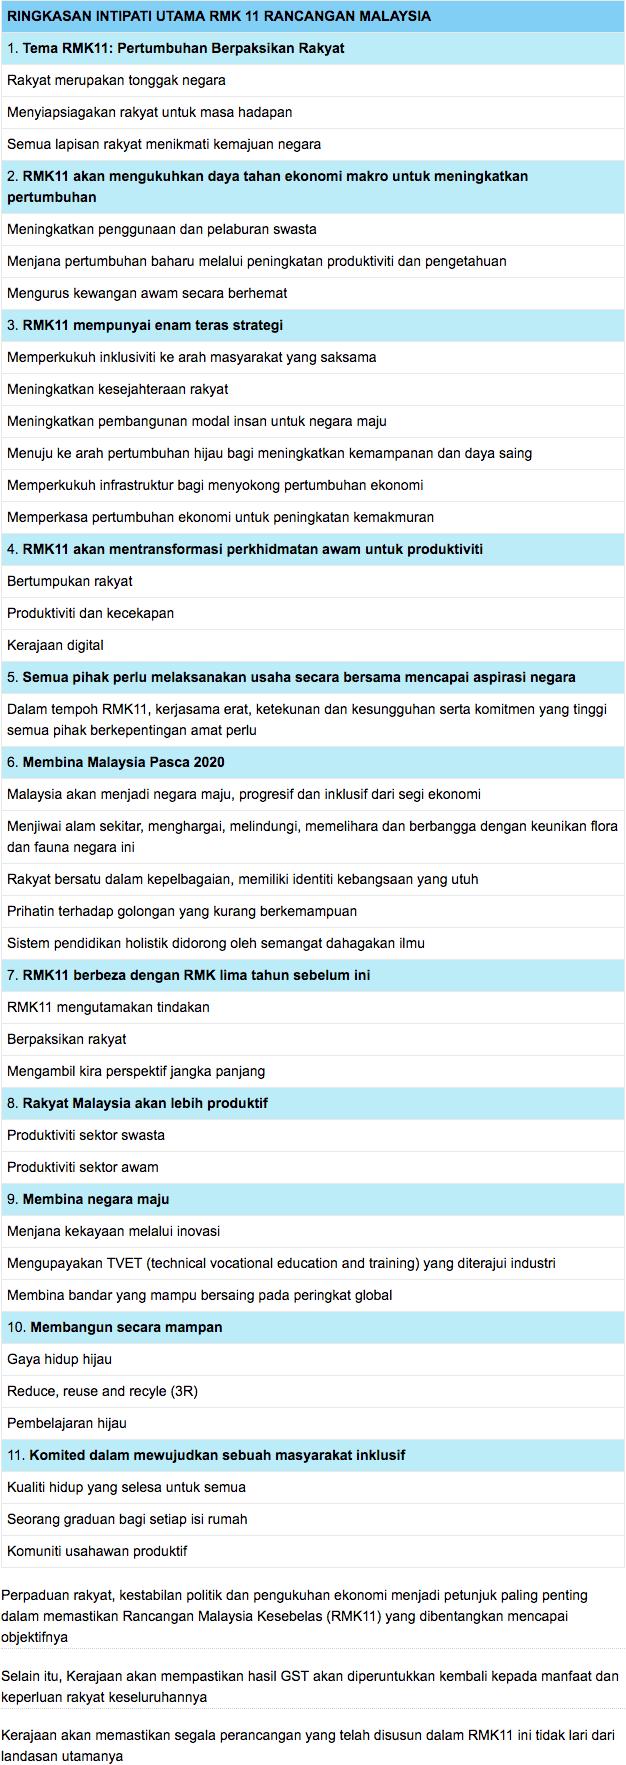 Ringkasan Intipati Utama Rmk 11 Rancangan Malaysia Ke 11 Exam Ptd Malaysia Exam Language